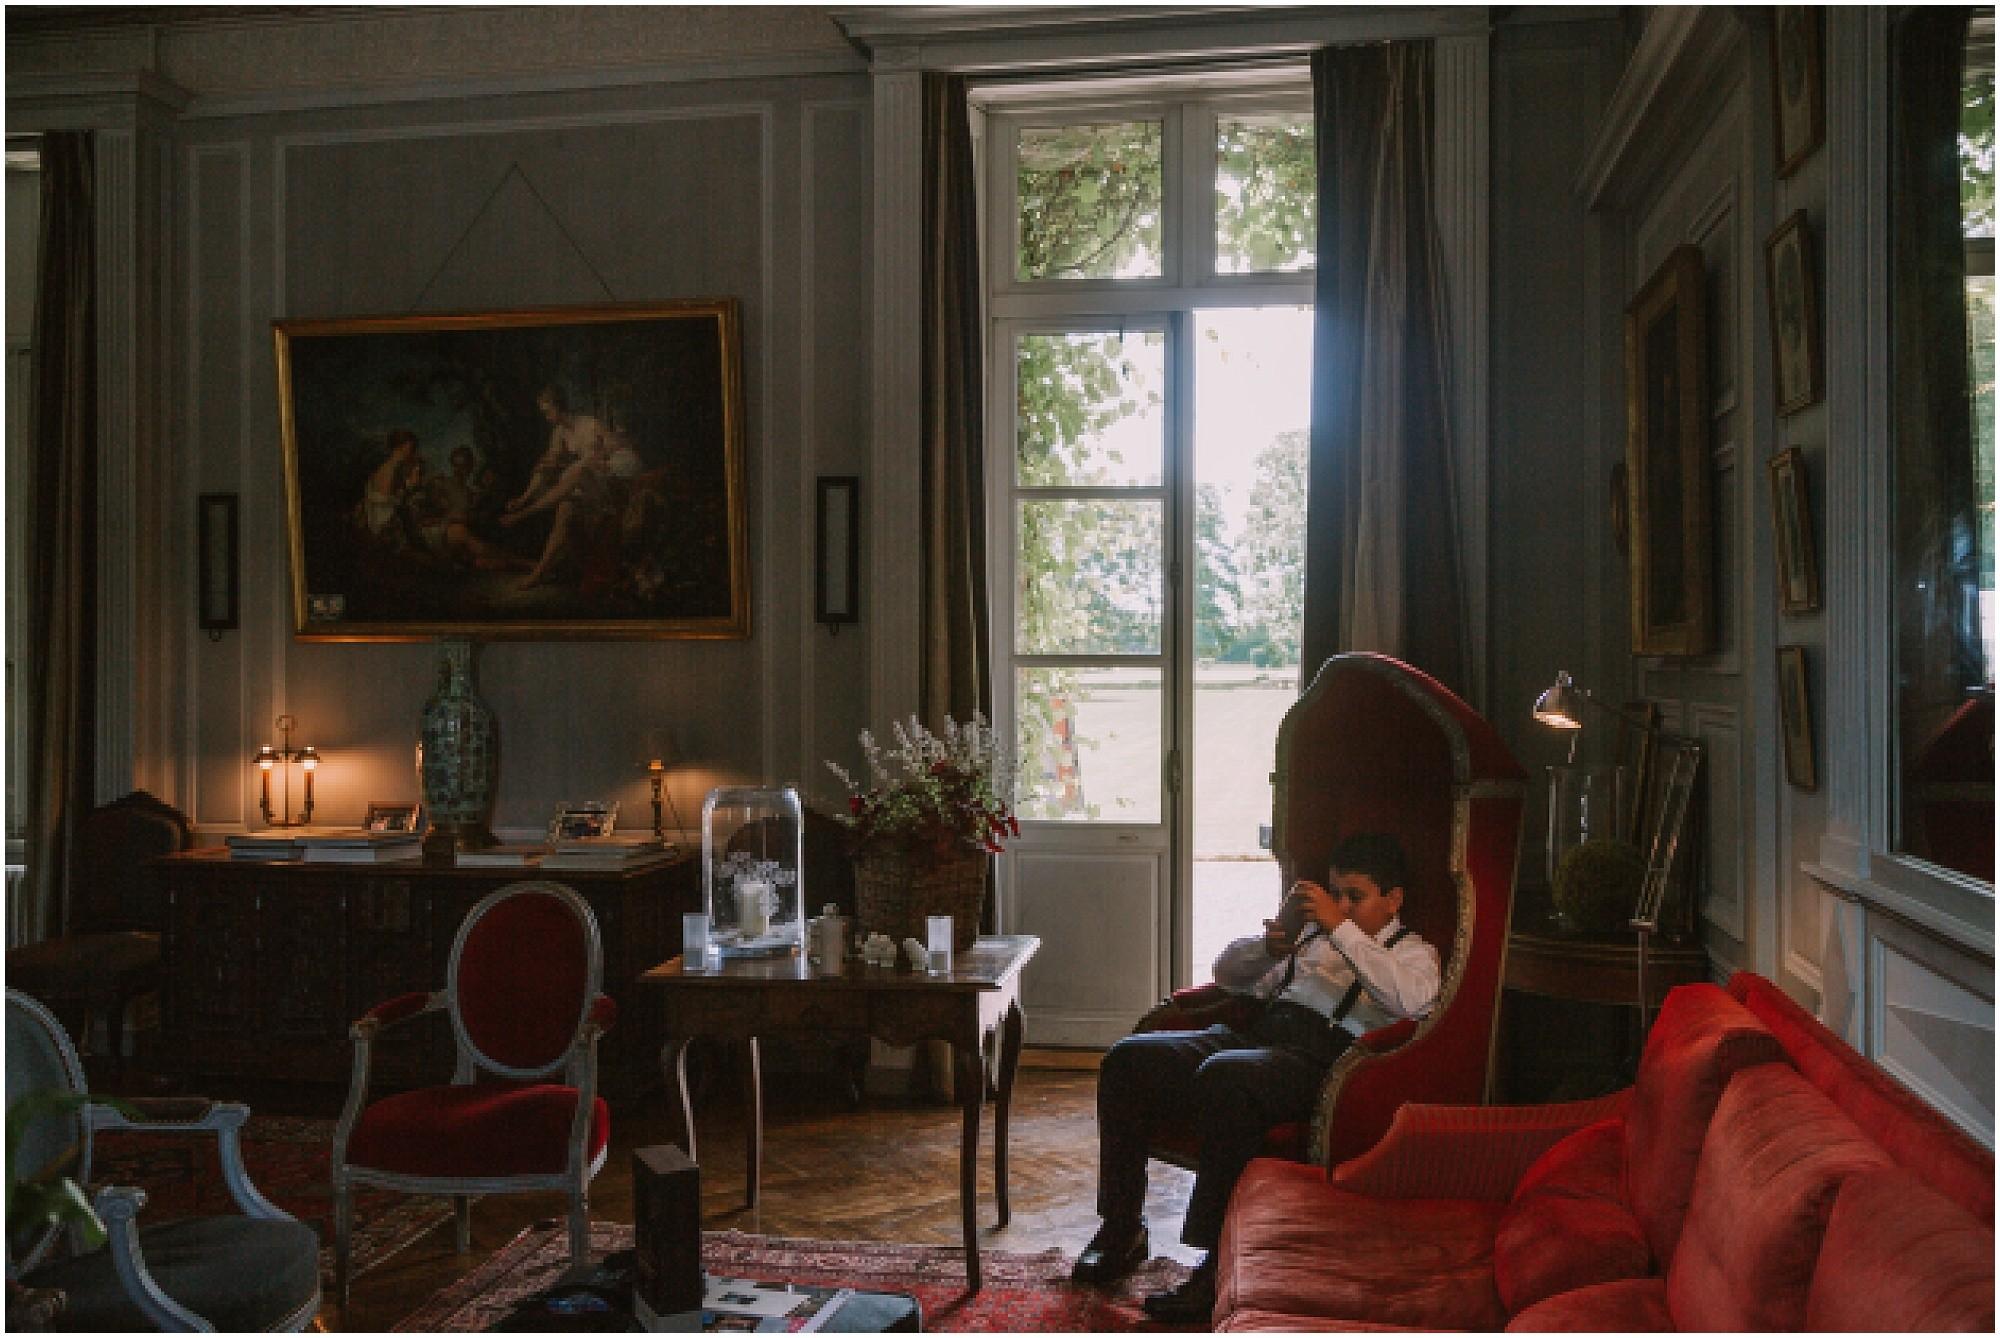 Kateryna-photos-photographer-mariage-chateau-saint-paterne-alencon-normandie-mayenne-le-mans_0003.jpg